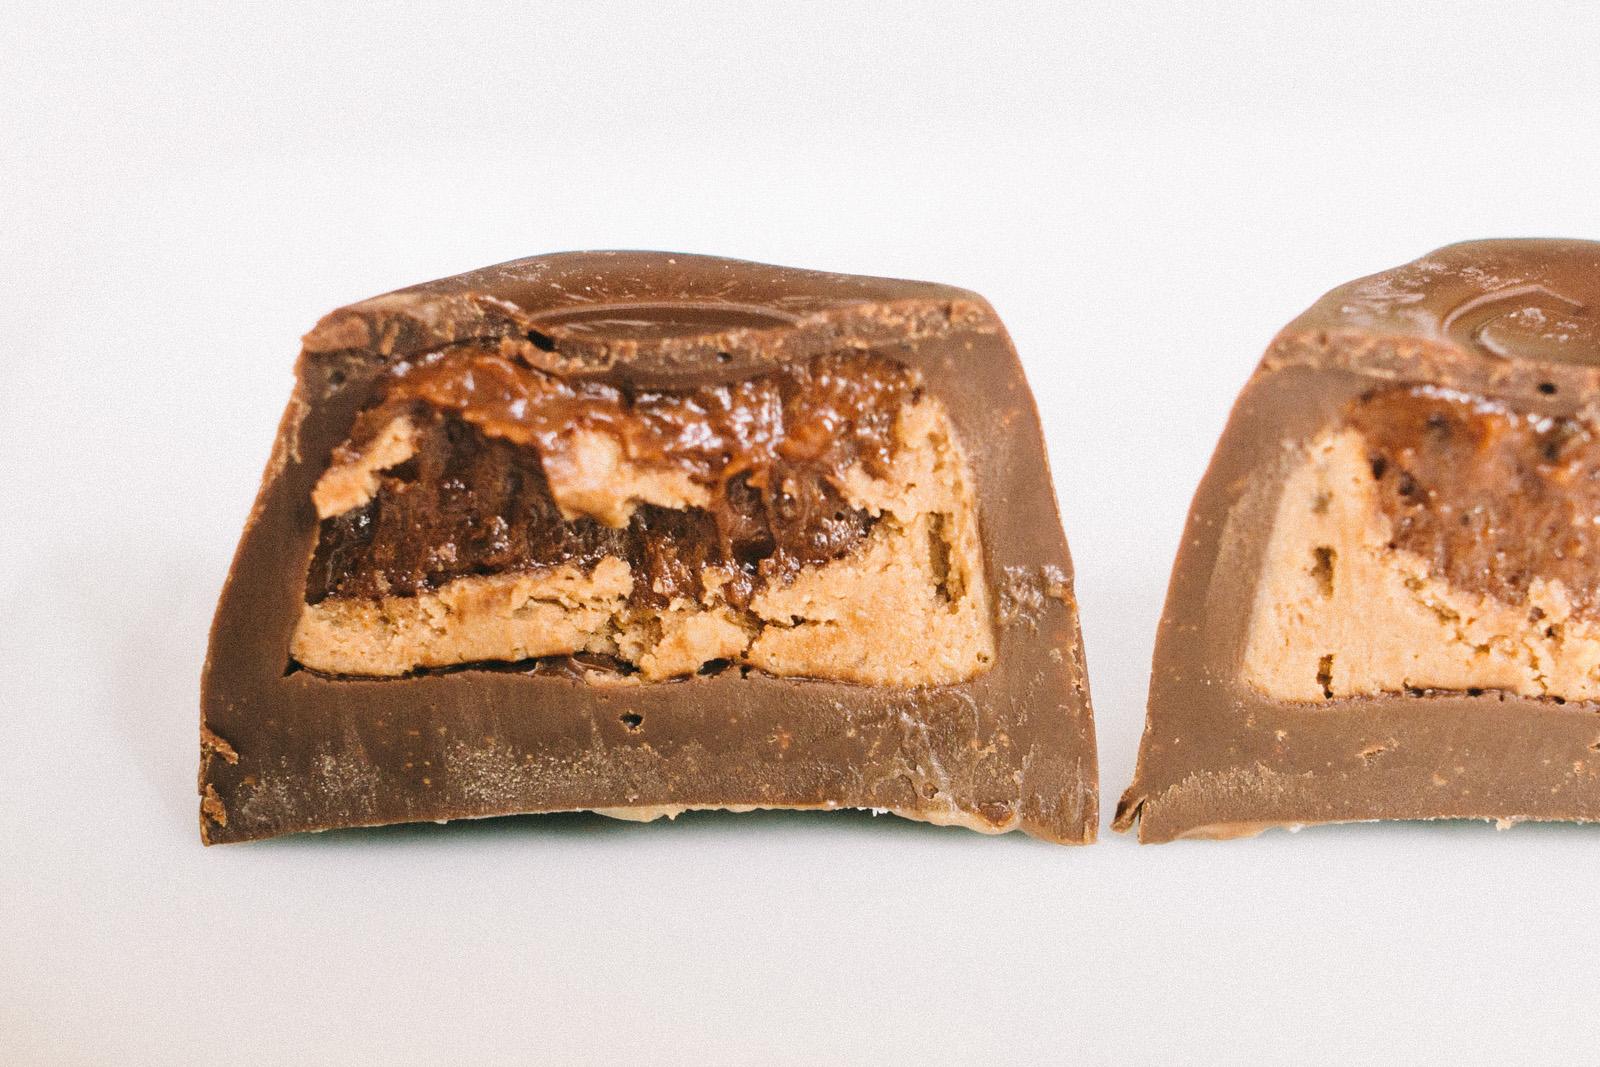 that-food-cray-godiva-chocolate-2013-mid-autumn-festival-mooncakes-44